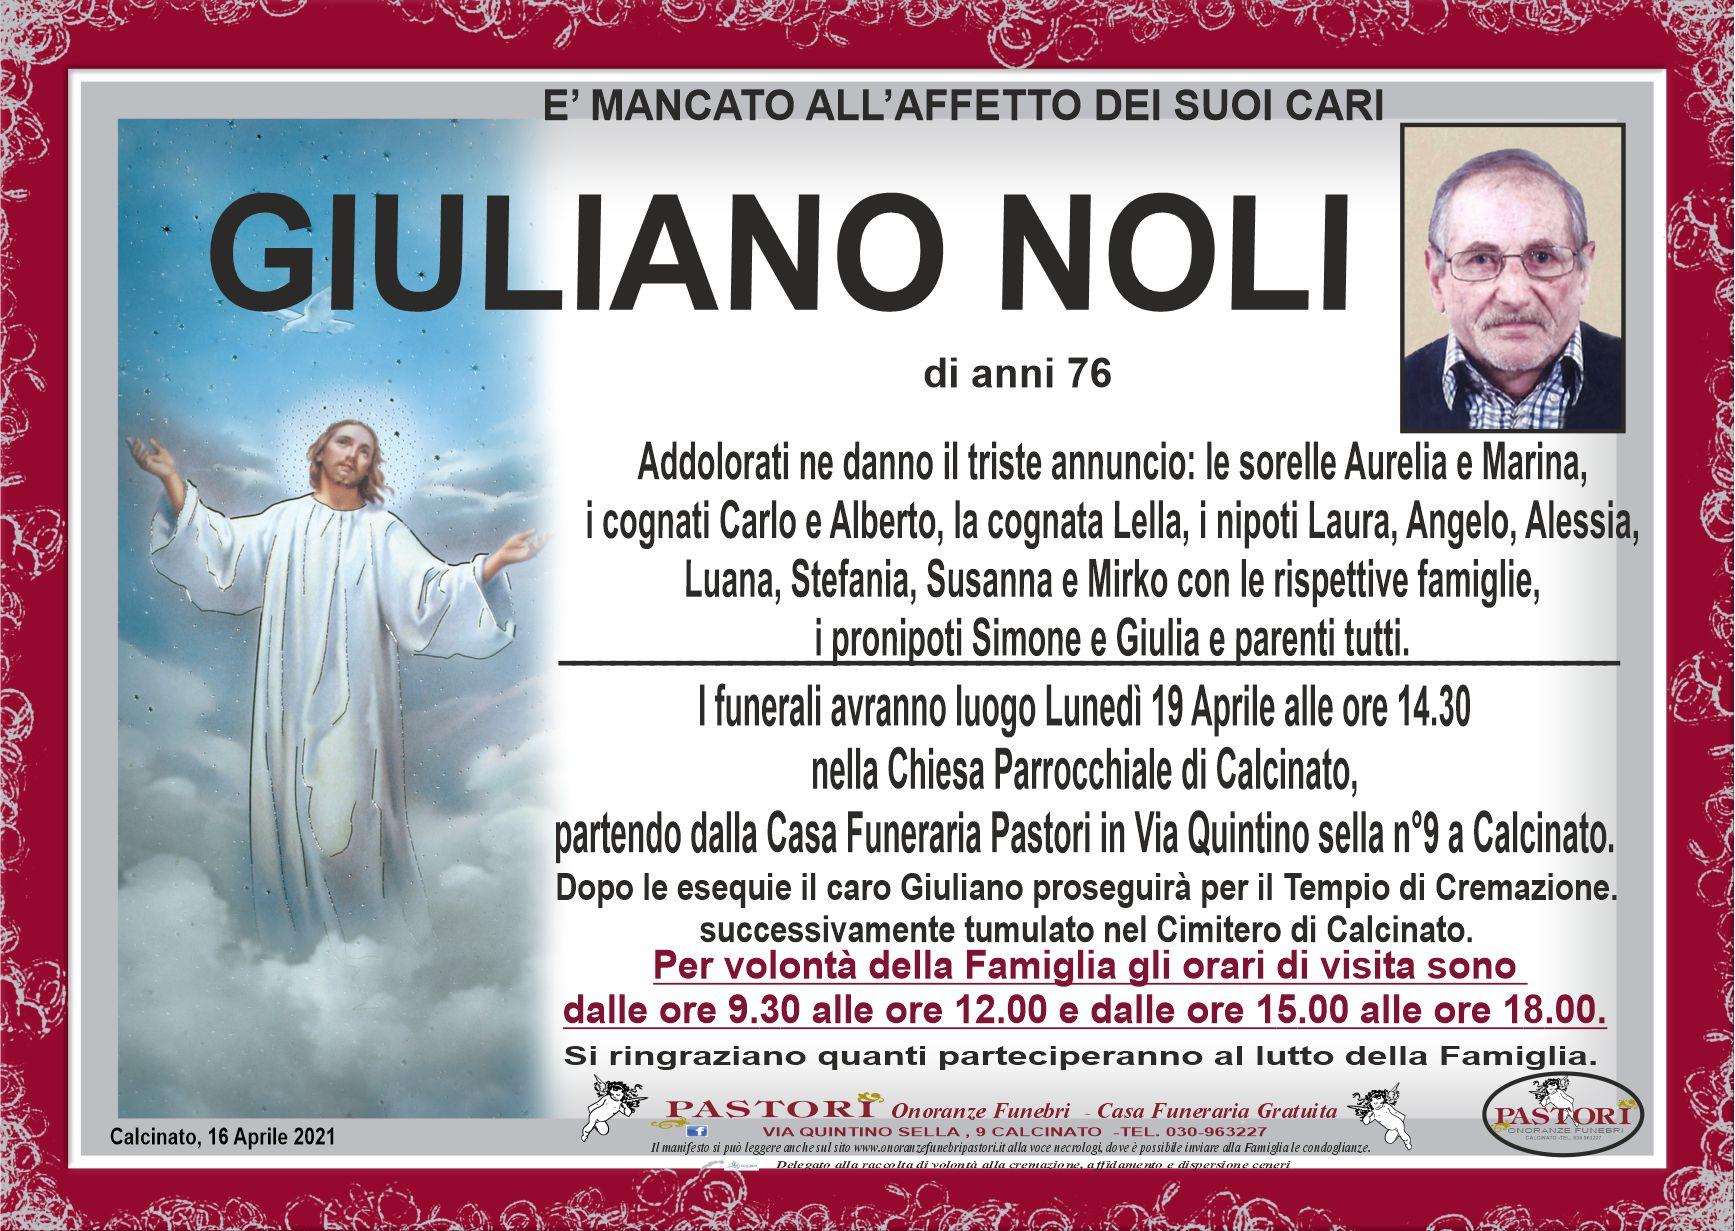 Giuliano Noli